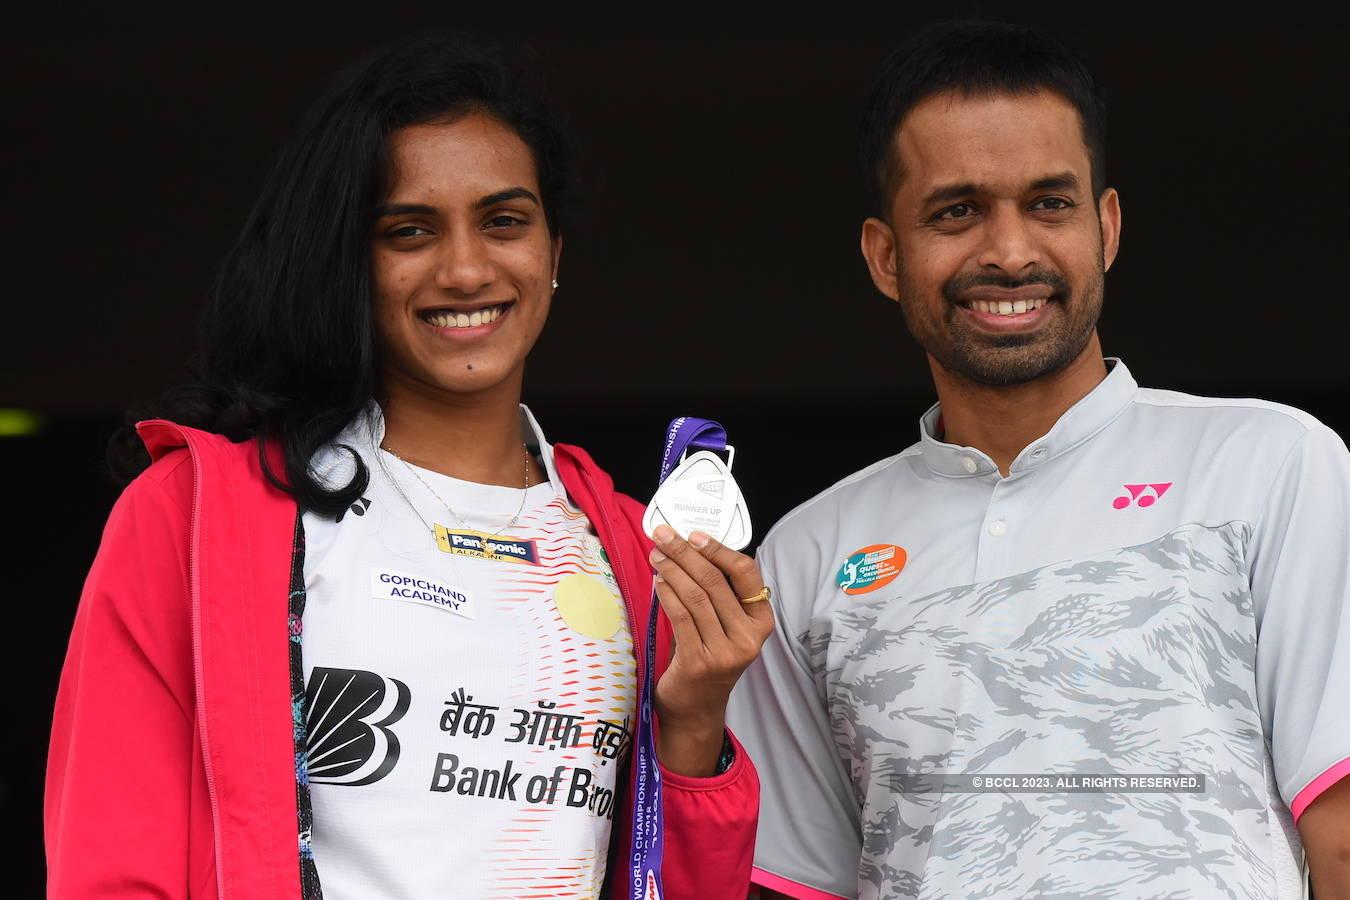 World Badminton championship: P.V. Sindhu wins silver